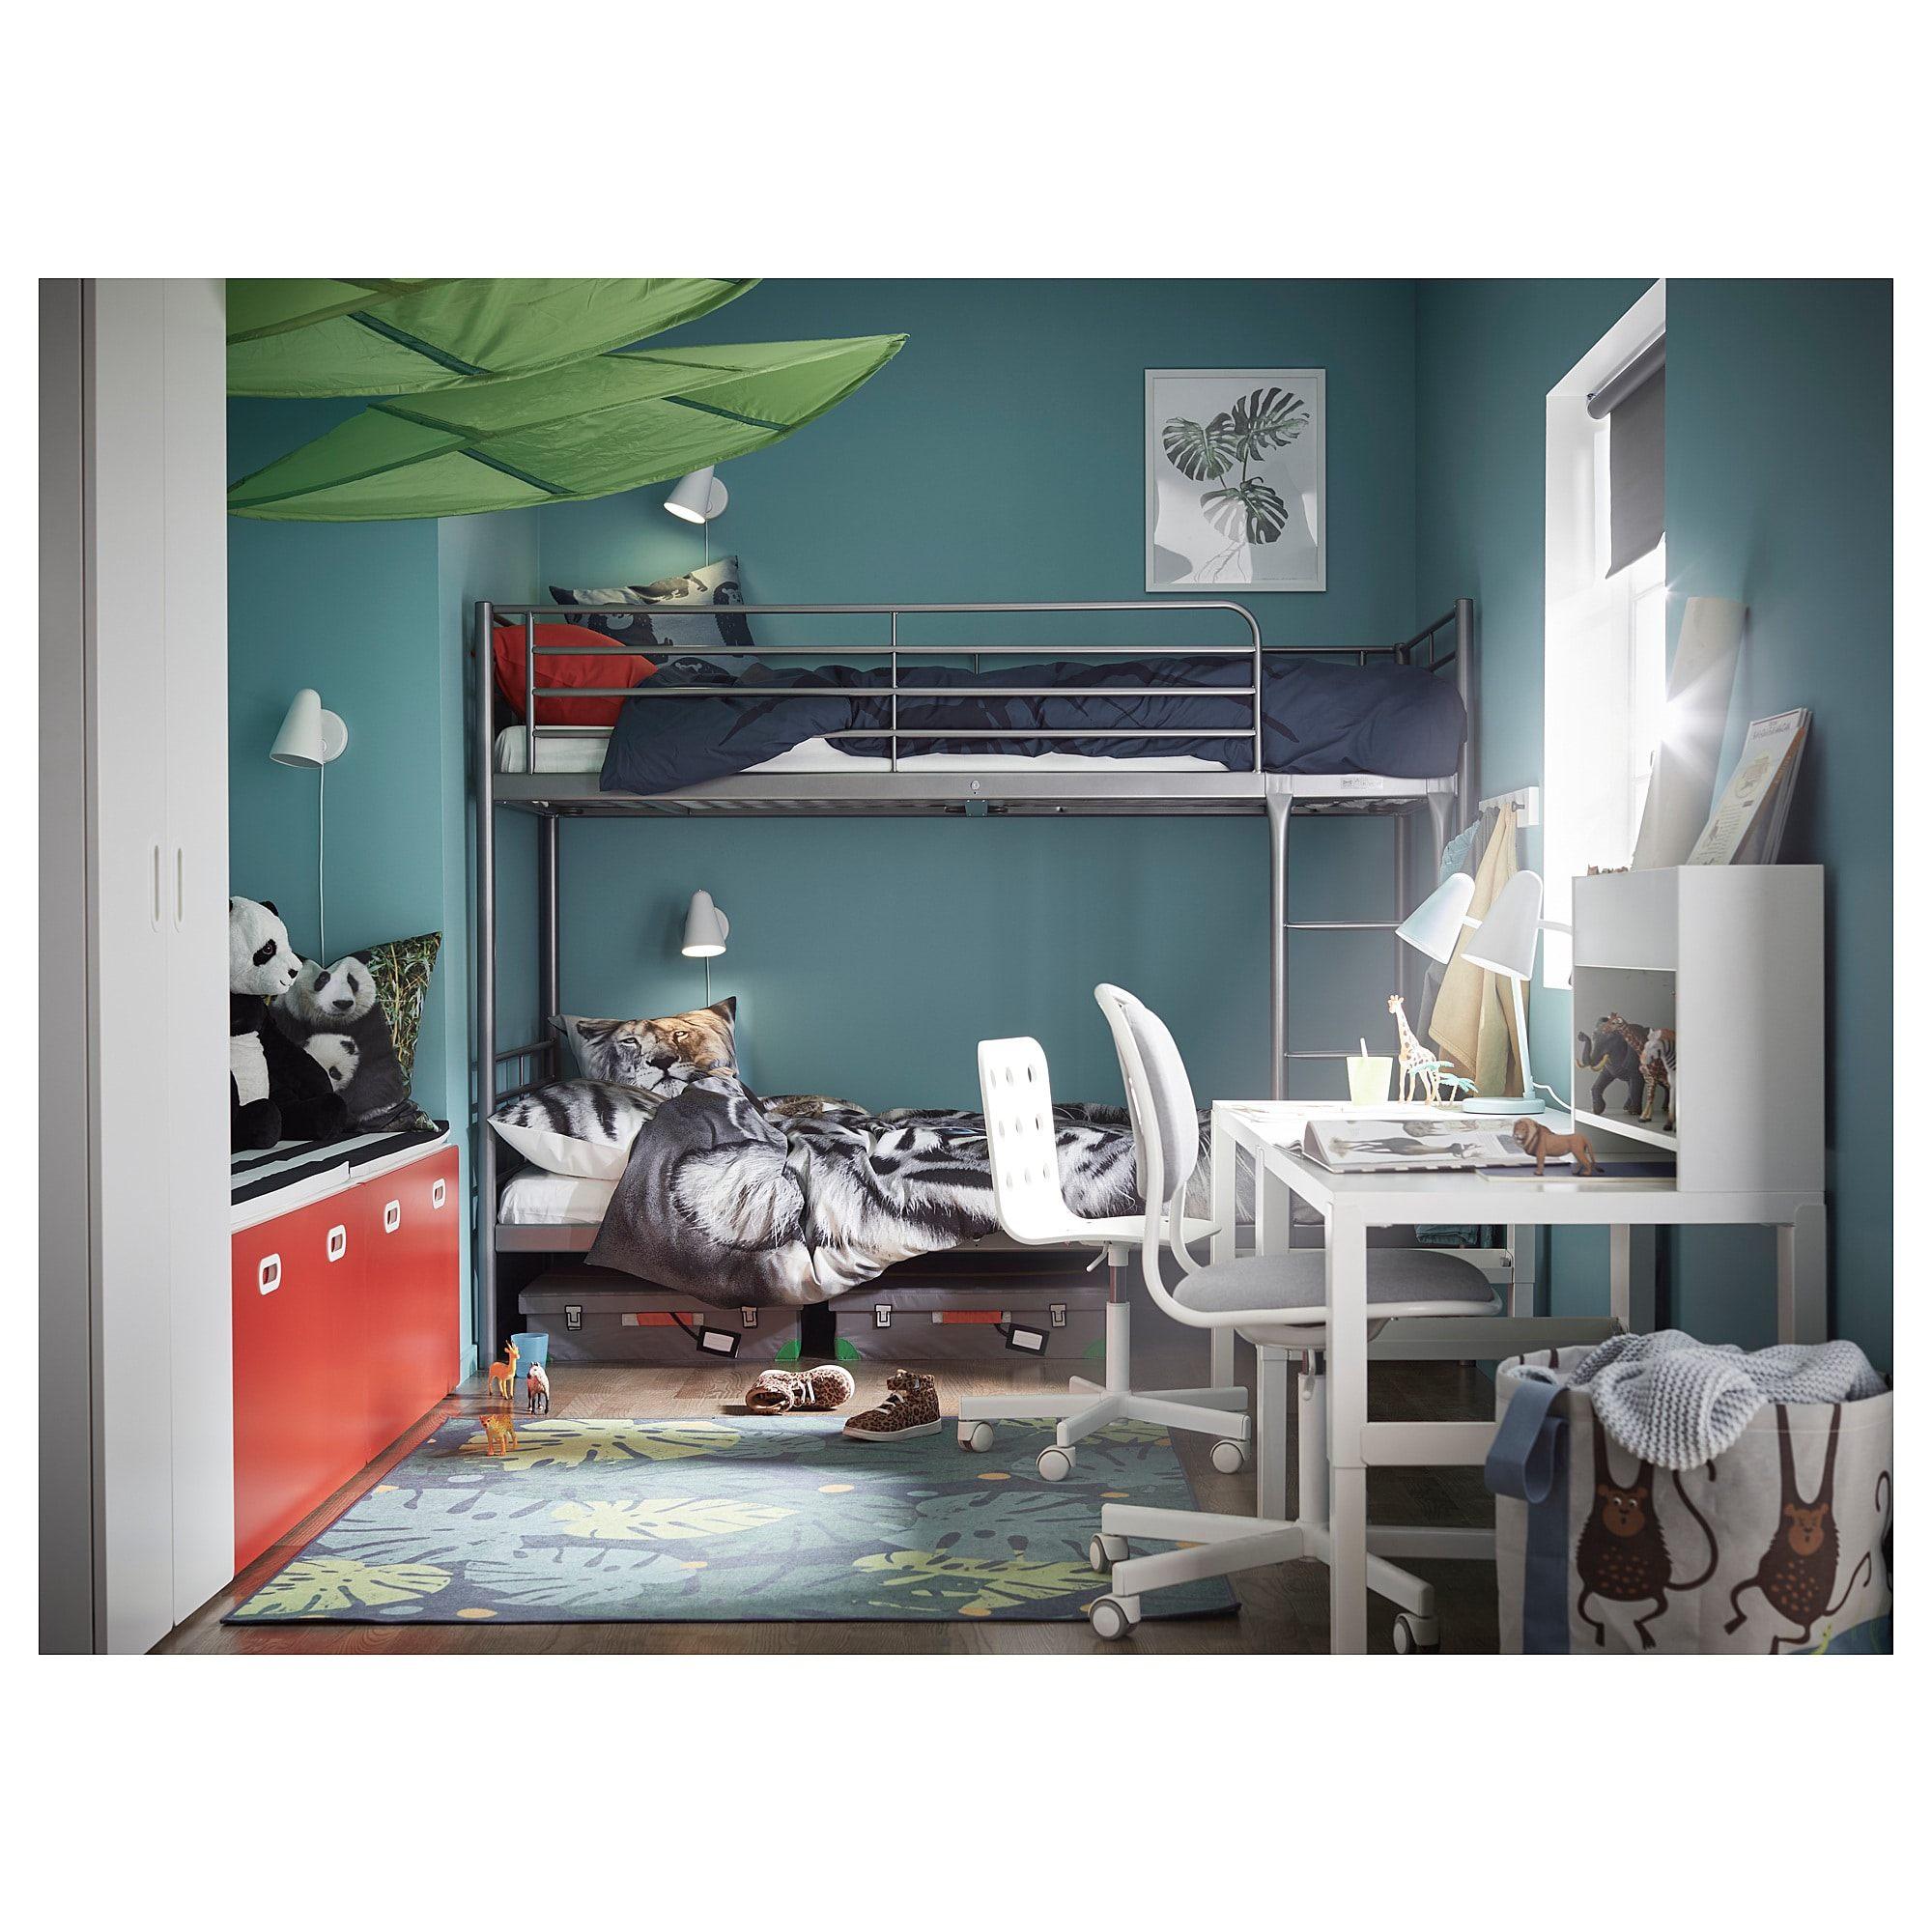 "Montage Lit Ikea De Luxe Sv""rta Bunk Bed Frame Ikea"